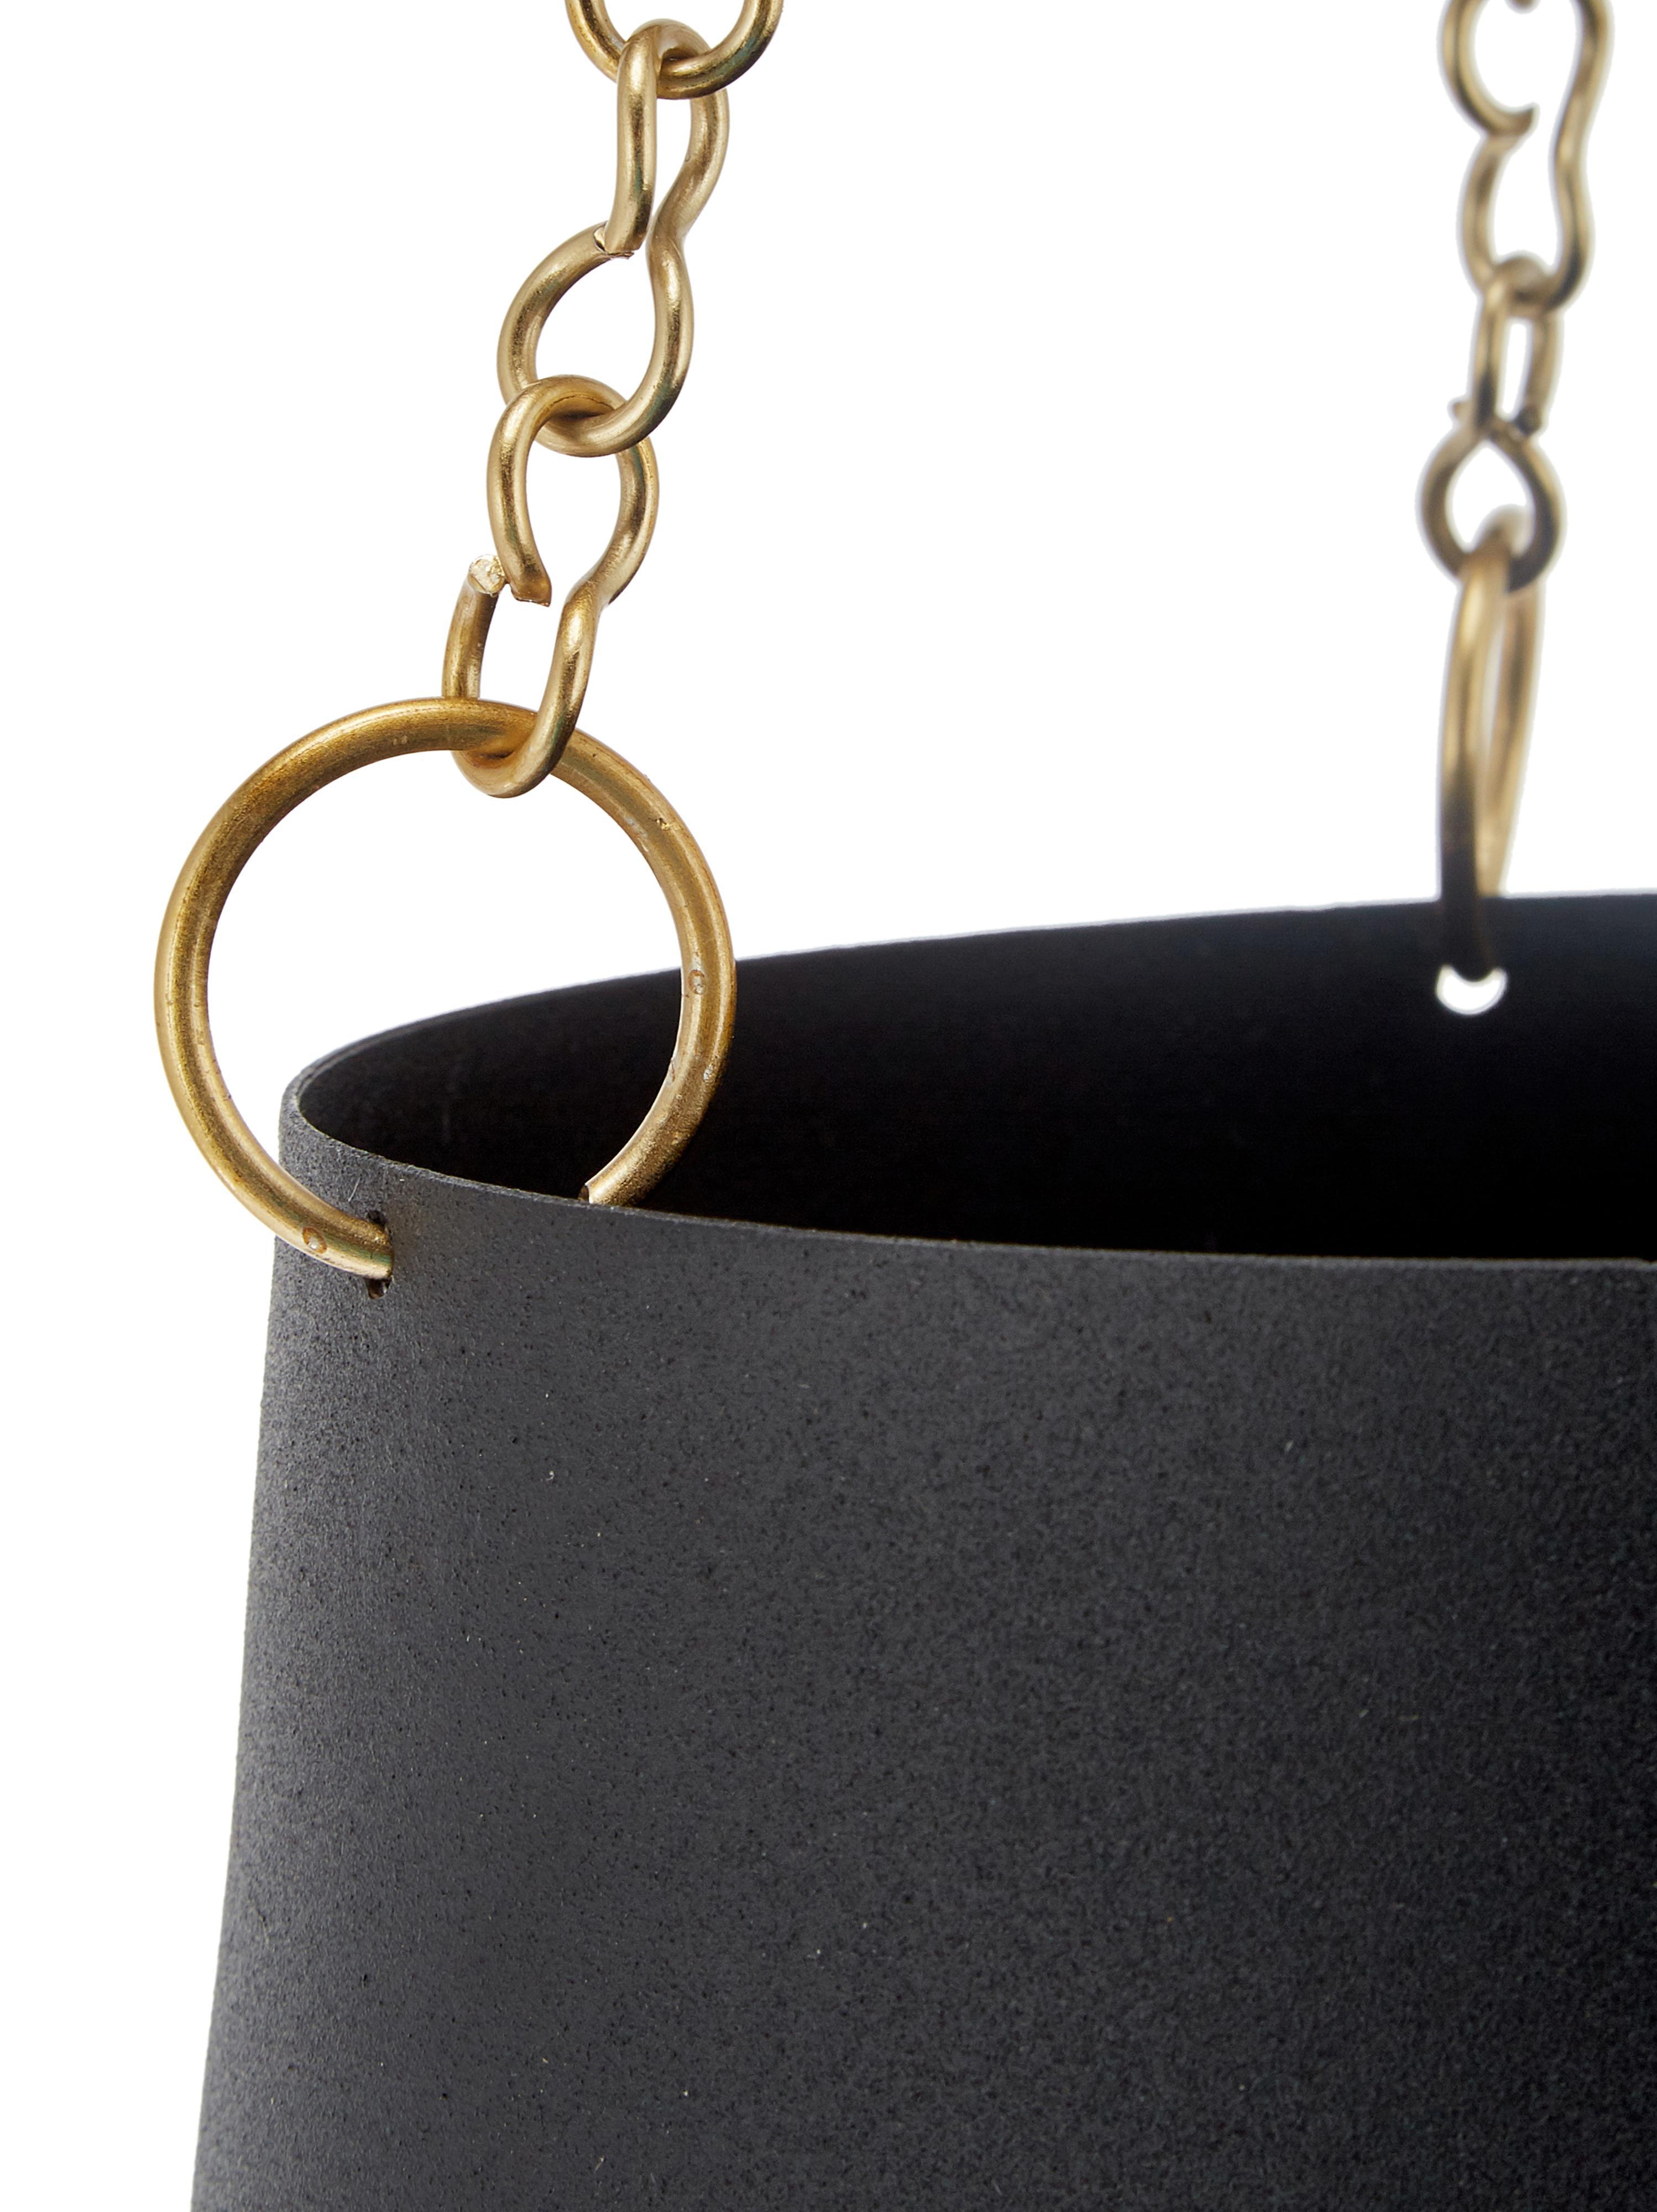 Blumenampel-Set Cask aus Metall, 3-tlg., Metall, lackiert, Schwarz, Sondergrößen